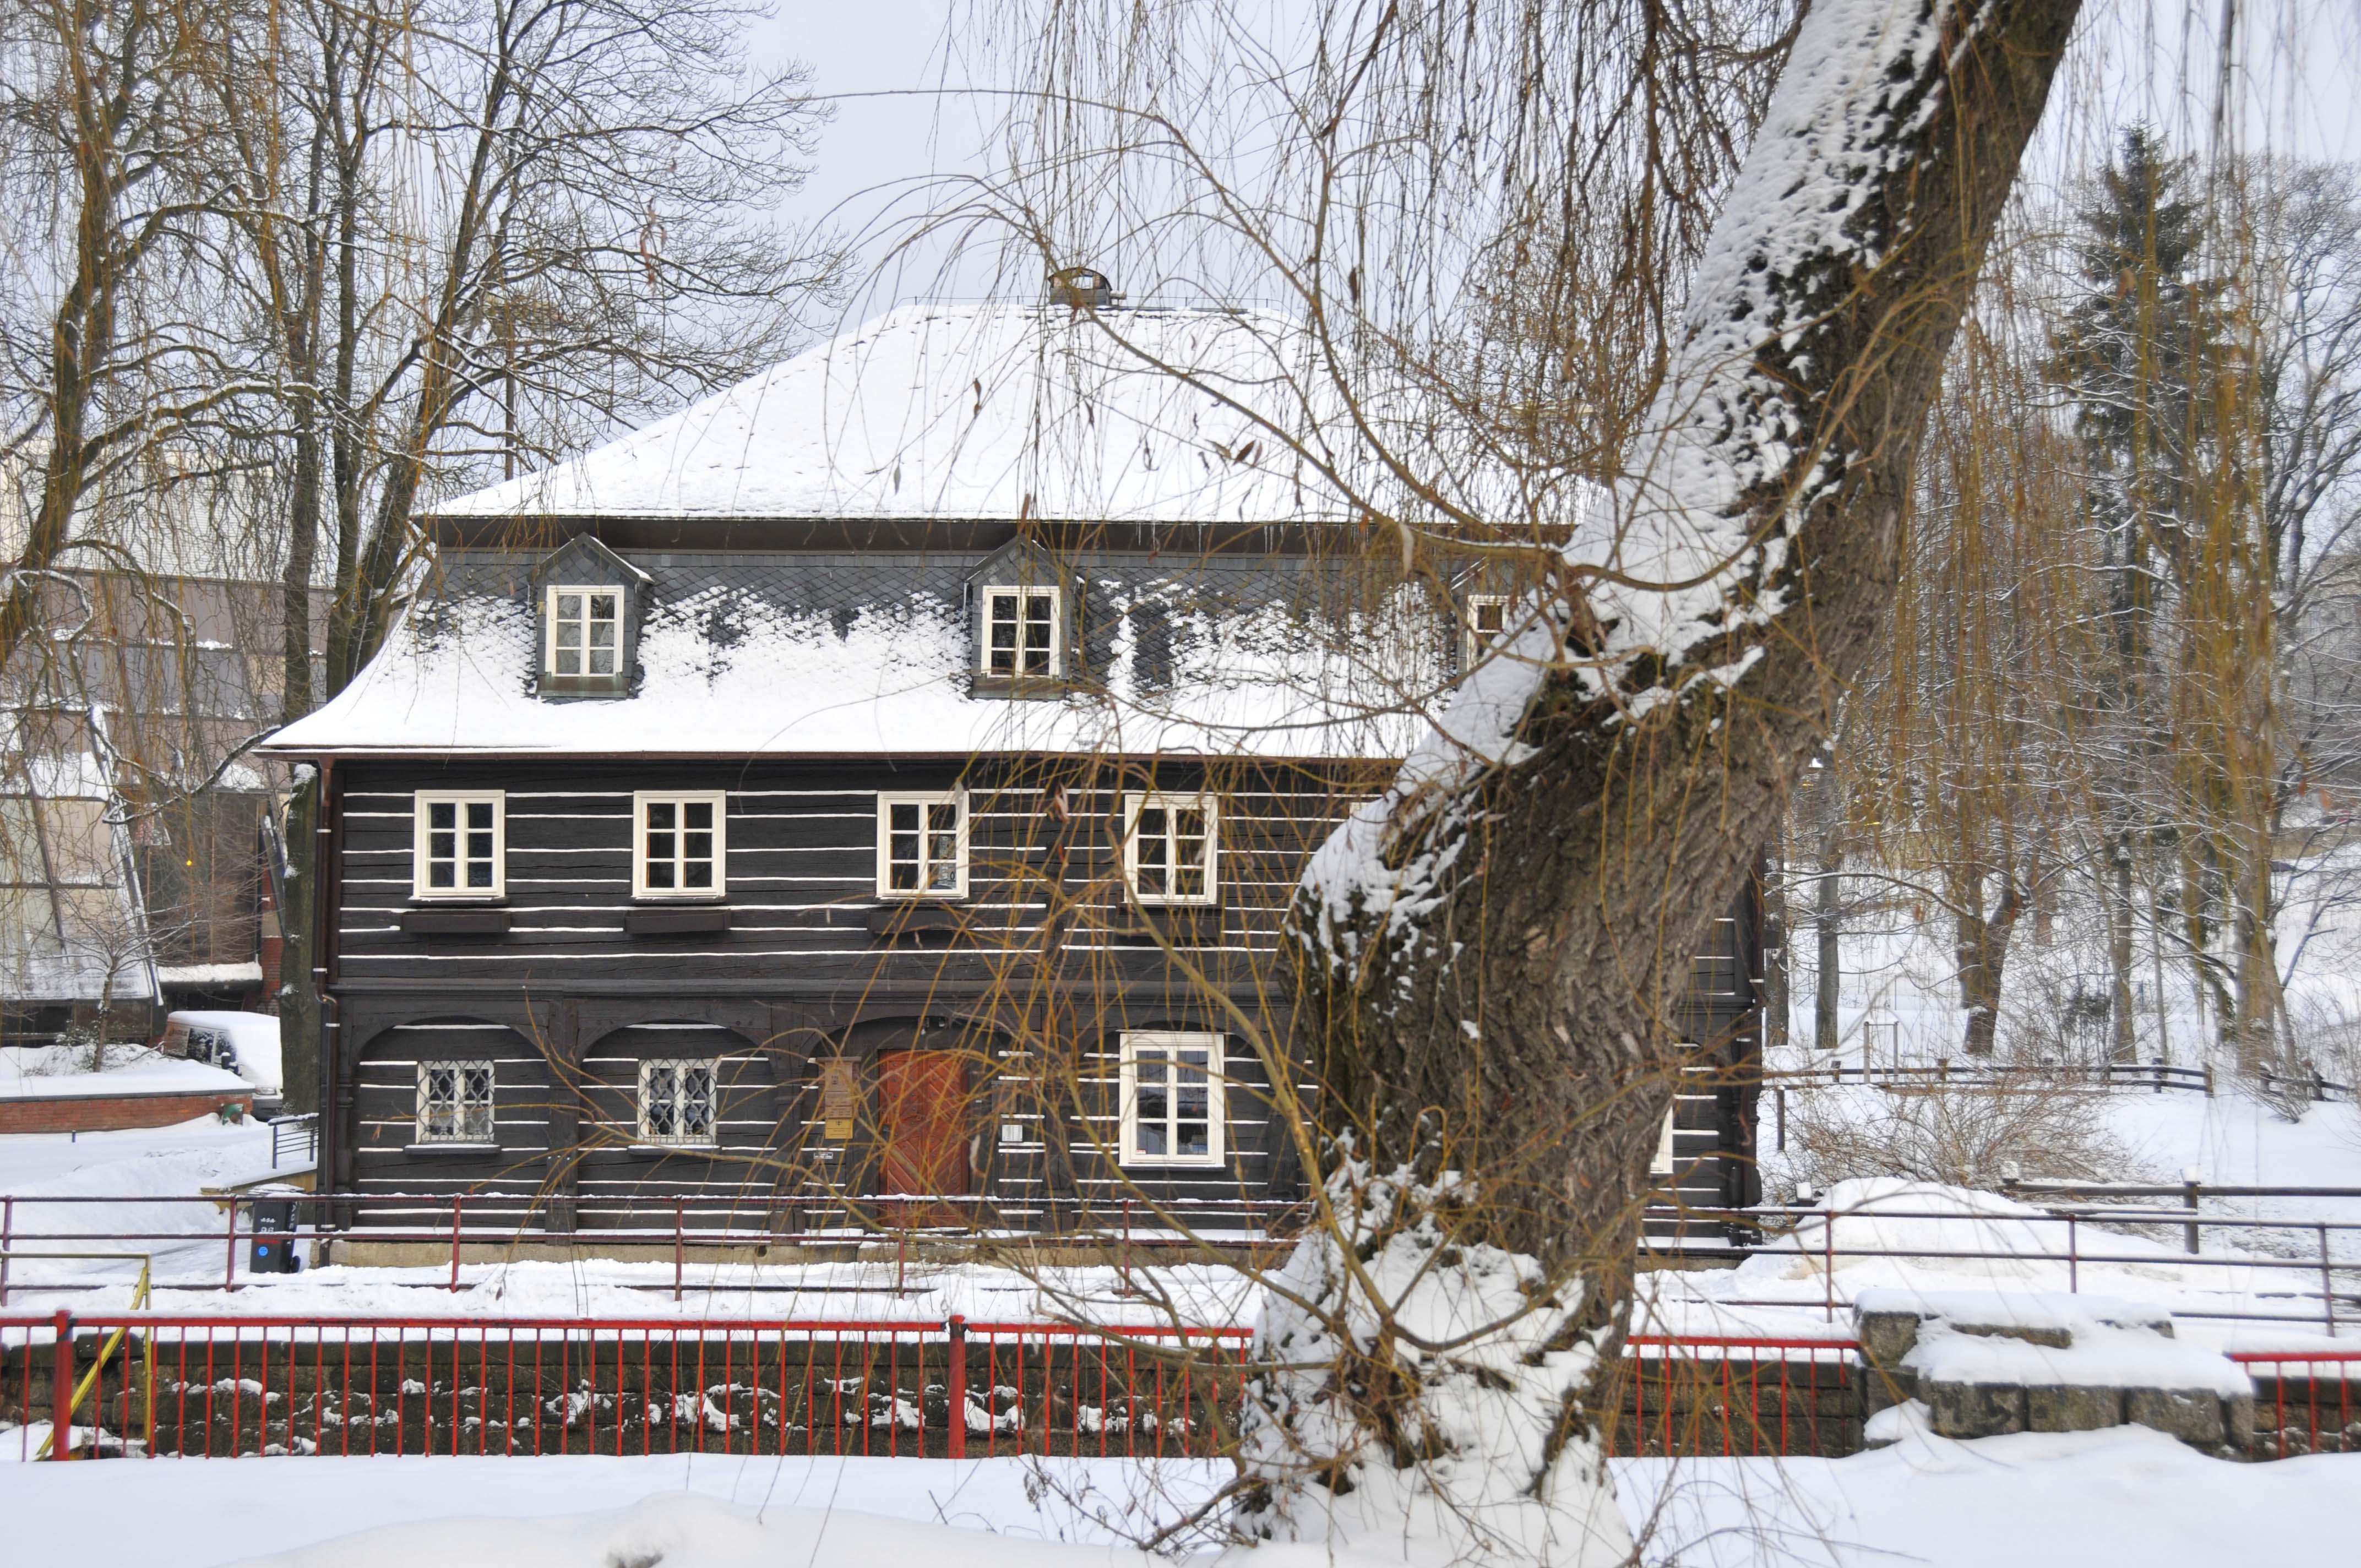 Šolcův dům